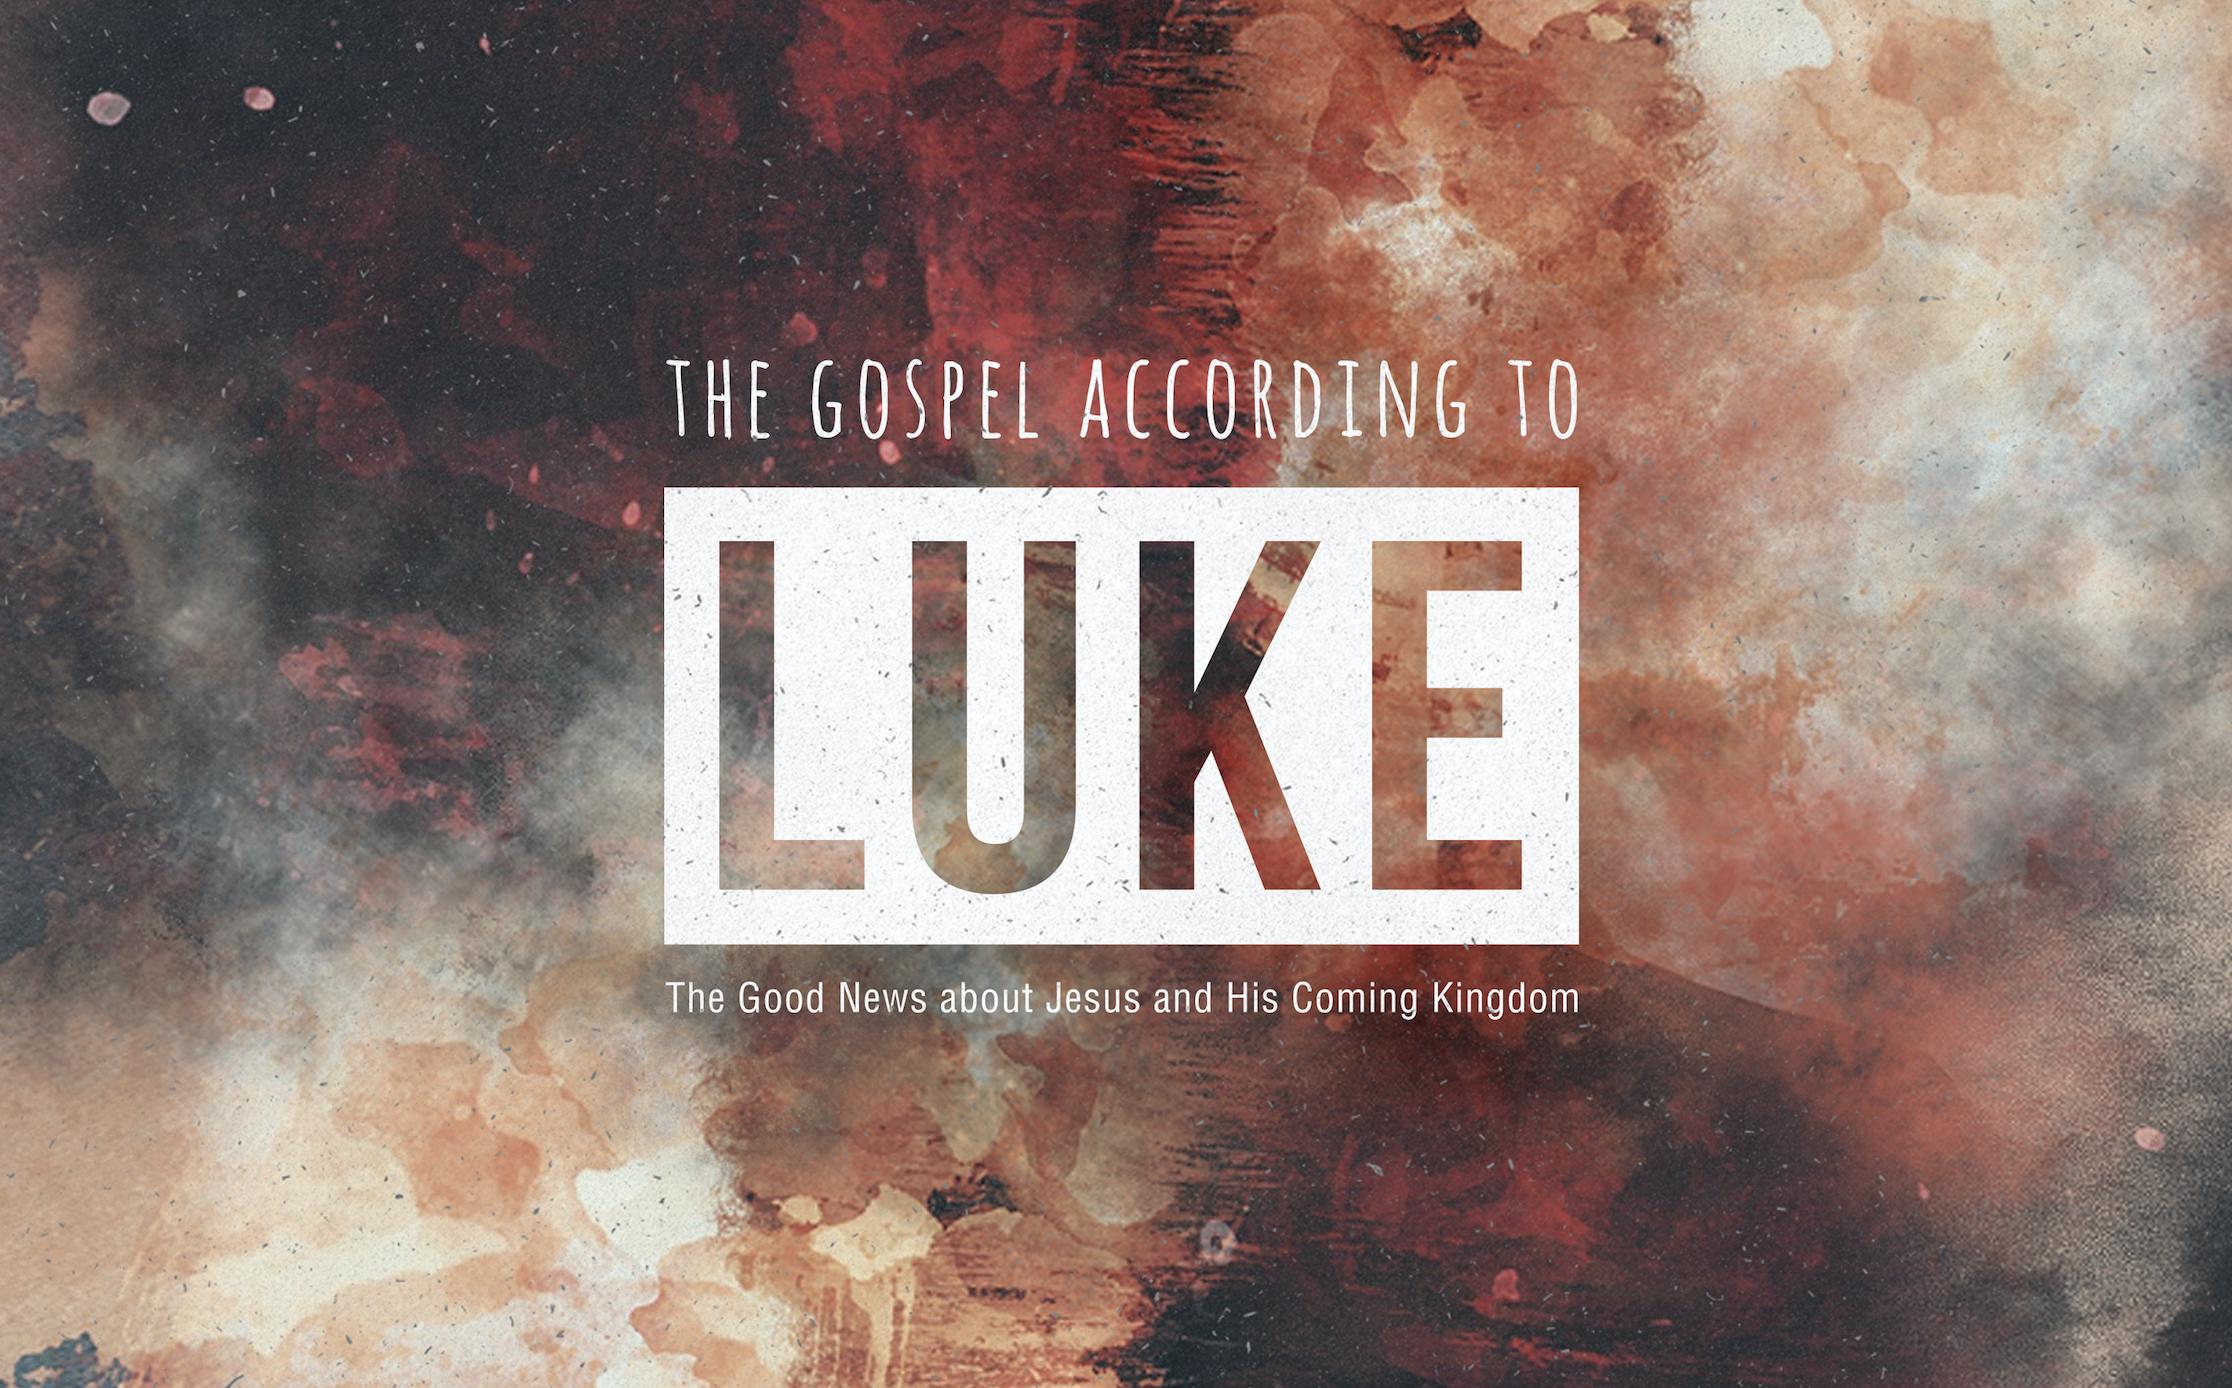 Luke Screen Shot 2018-11-26 at 12.38.17 PM.png